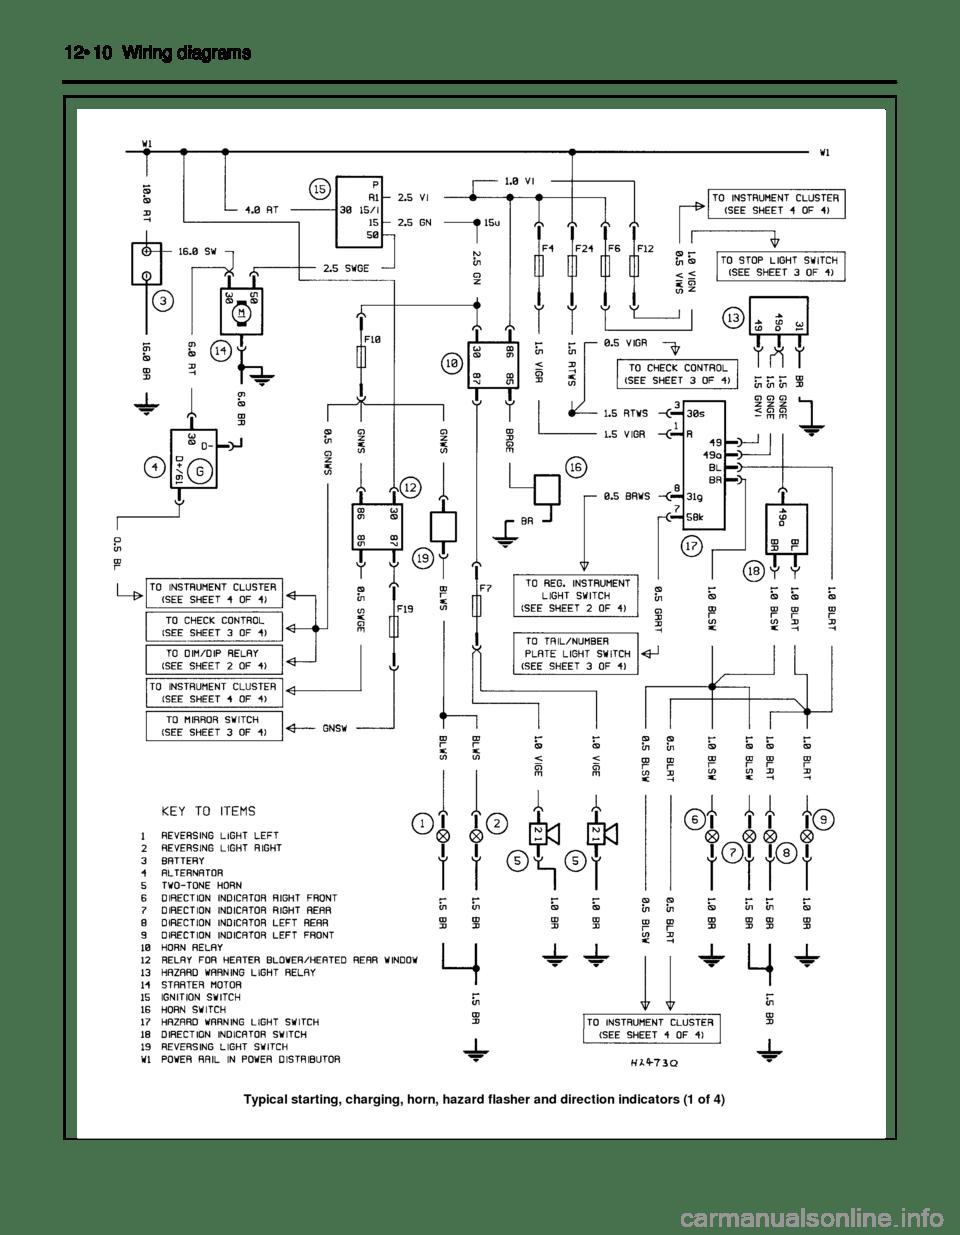 BMW 3 SERIES 1988 E30 Workshop Manual